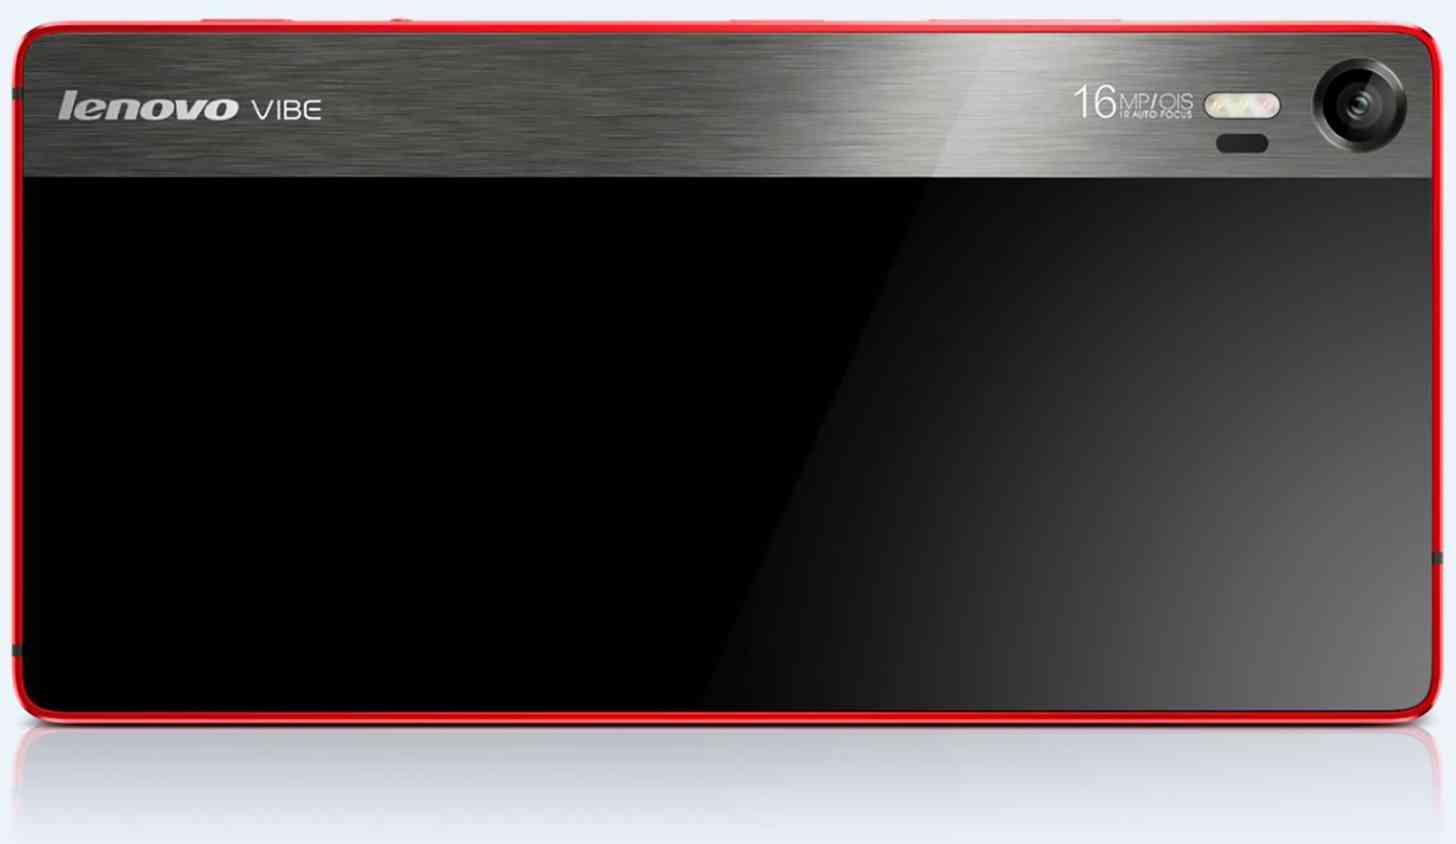 Lenovo Vibe Shot cameraphone rear official